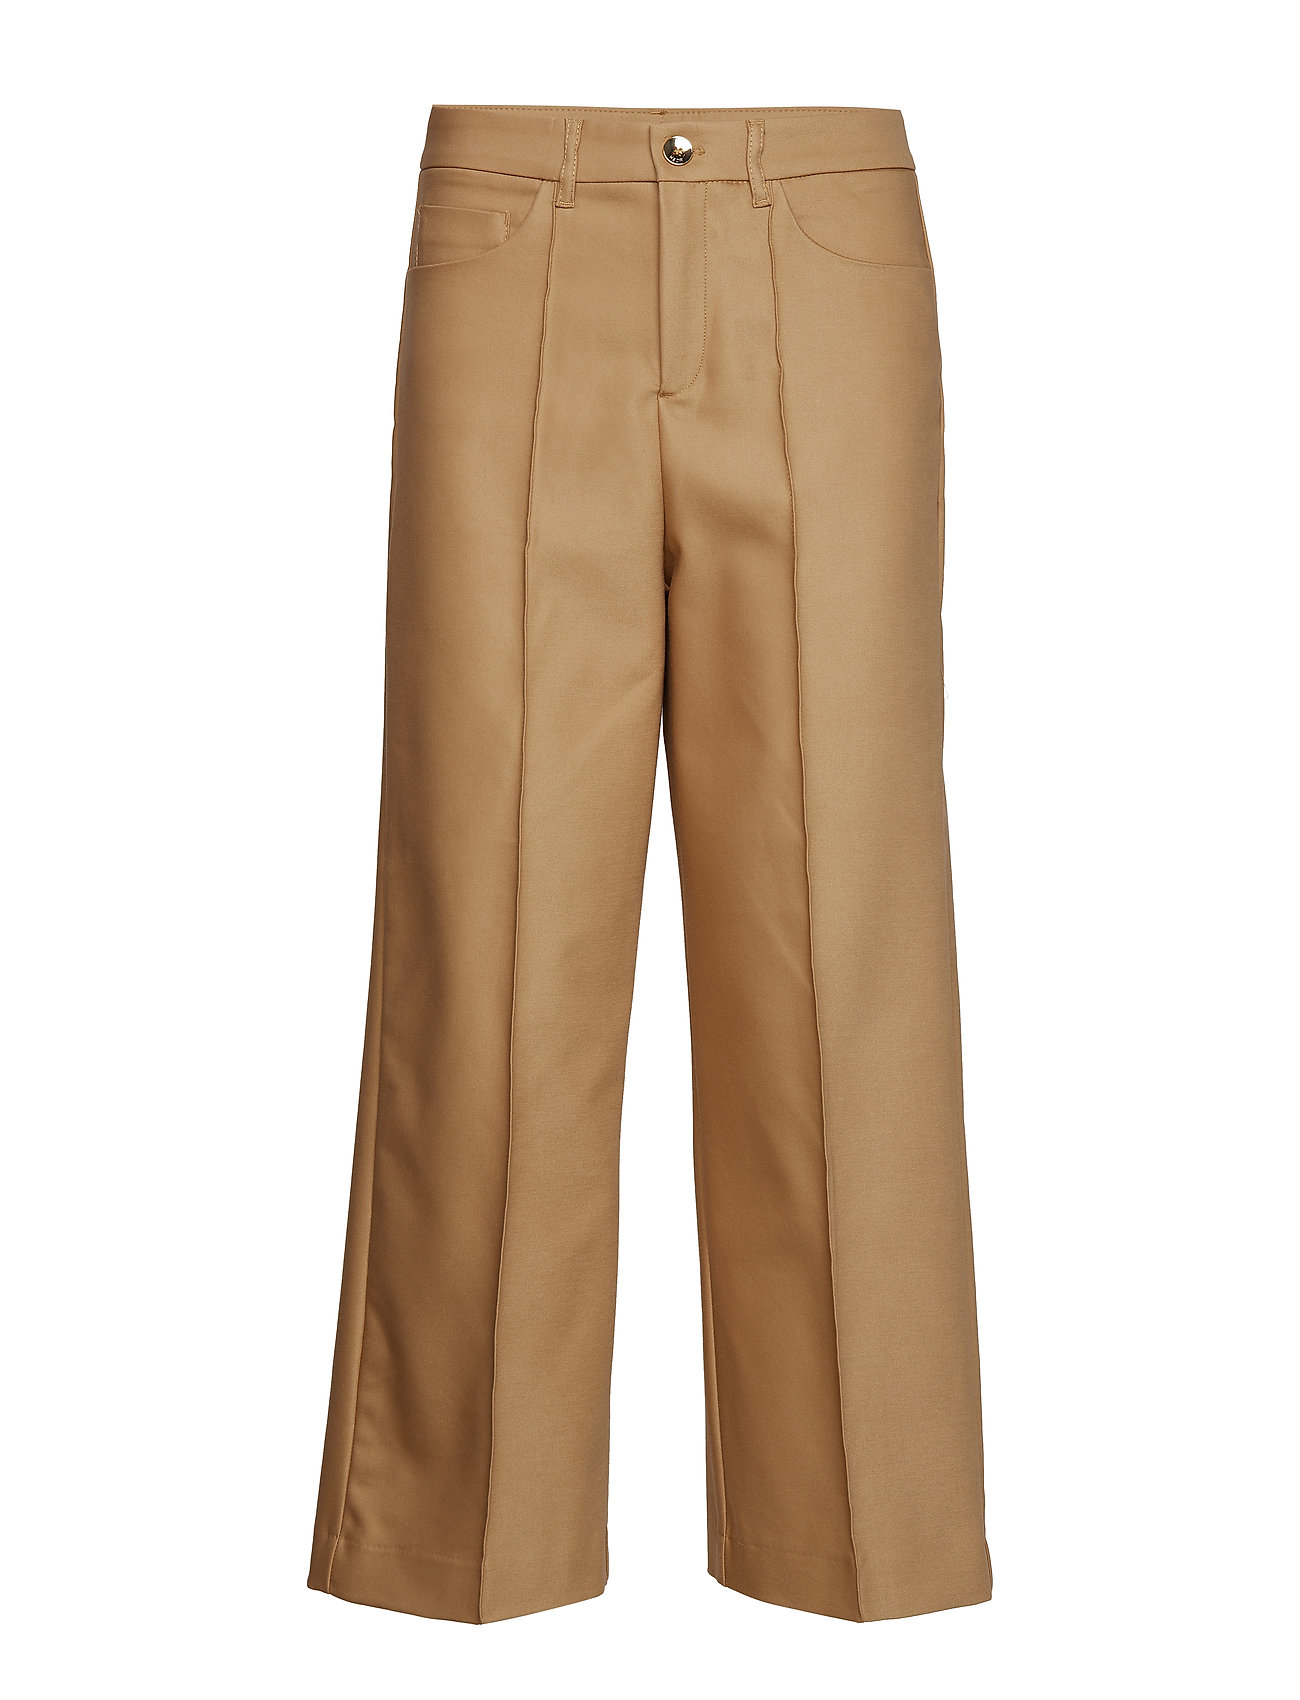 MOS MOSH Como Night Pant Sustainable - BURRO CAMEL